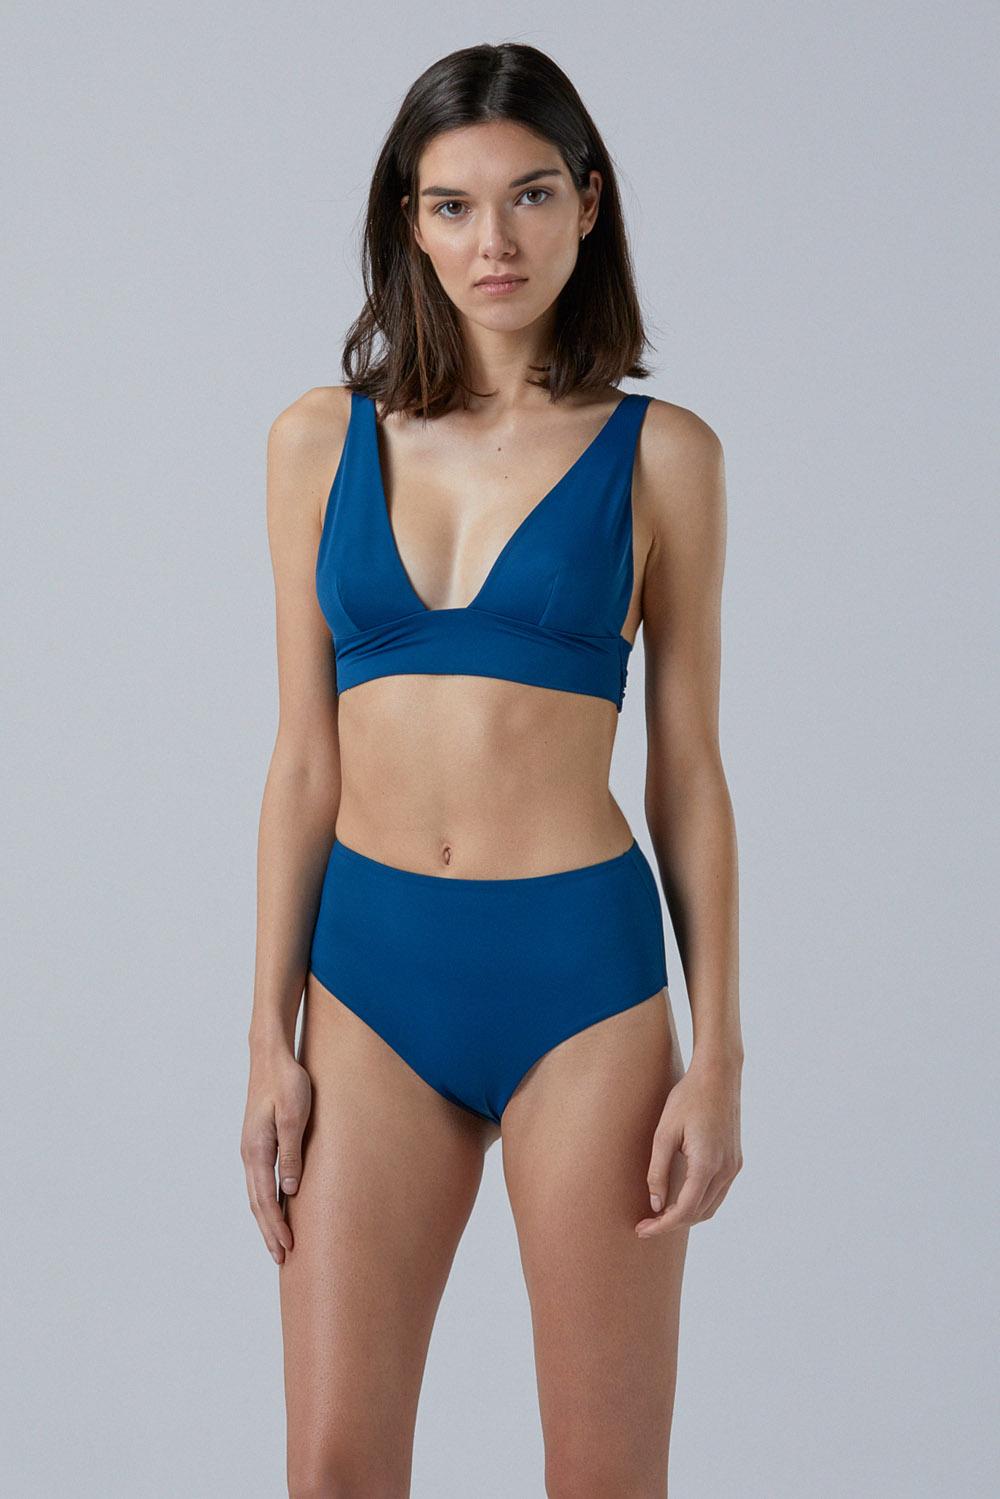 Sustainable Luxury Swimwear / Ropa de baño sostenible, eco bikini / bikini ecológico. Mana + Milos in plum, by NOW_THEN